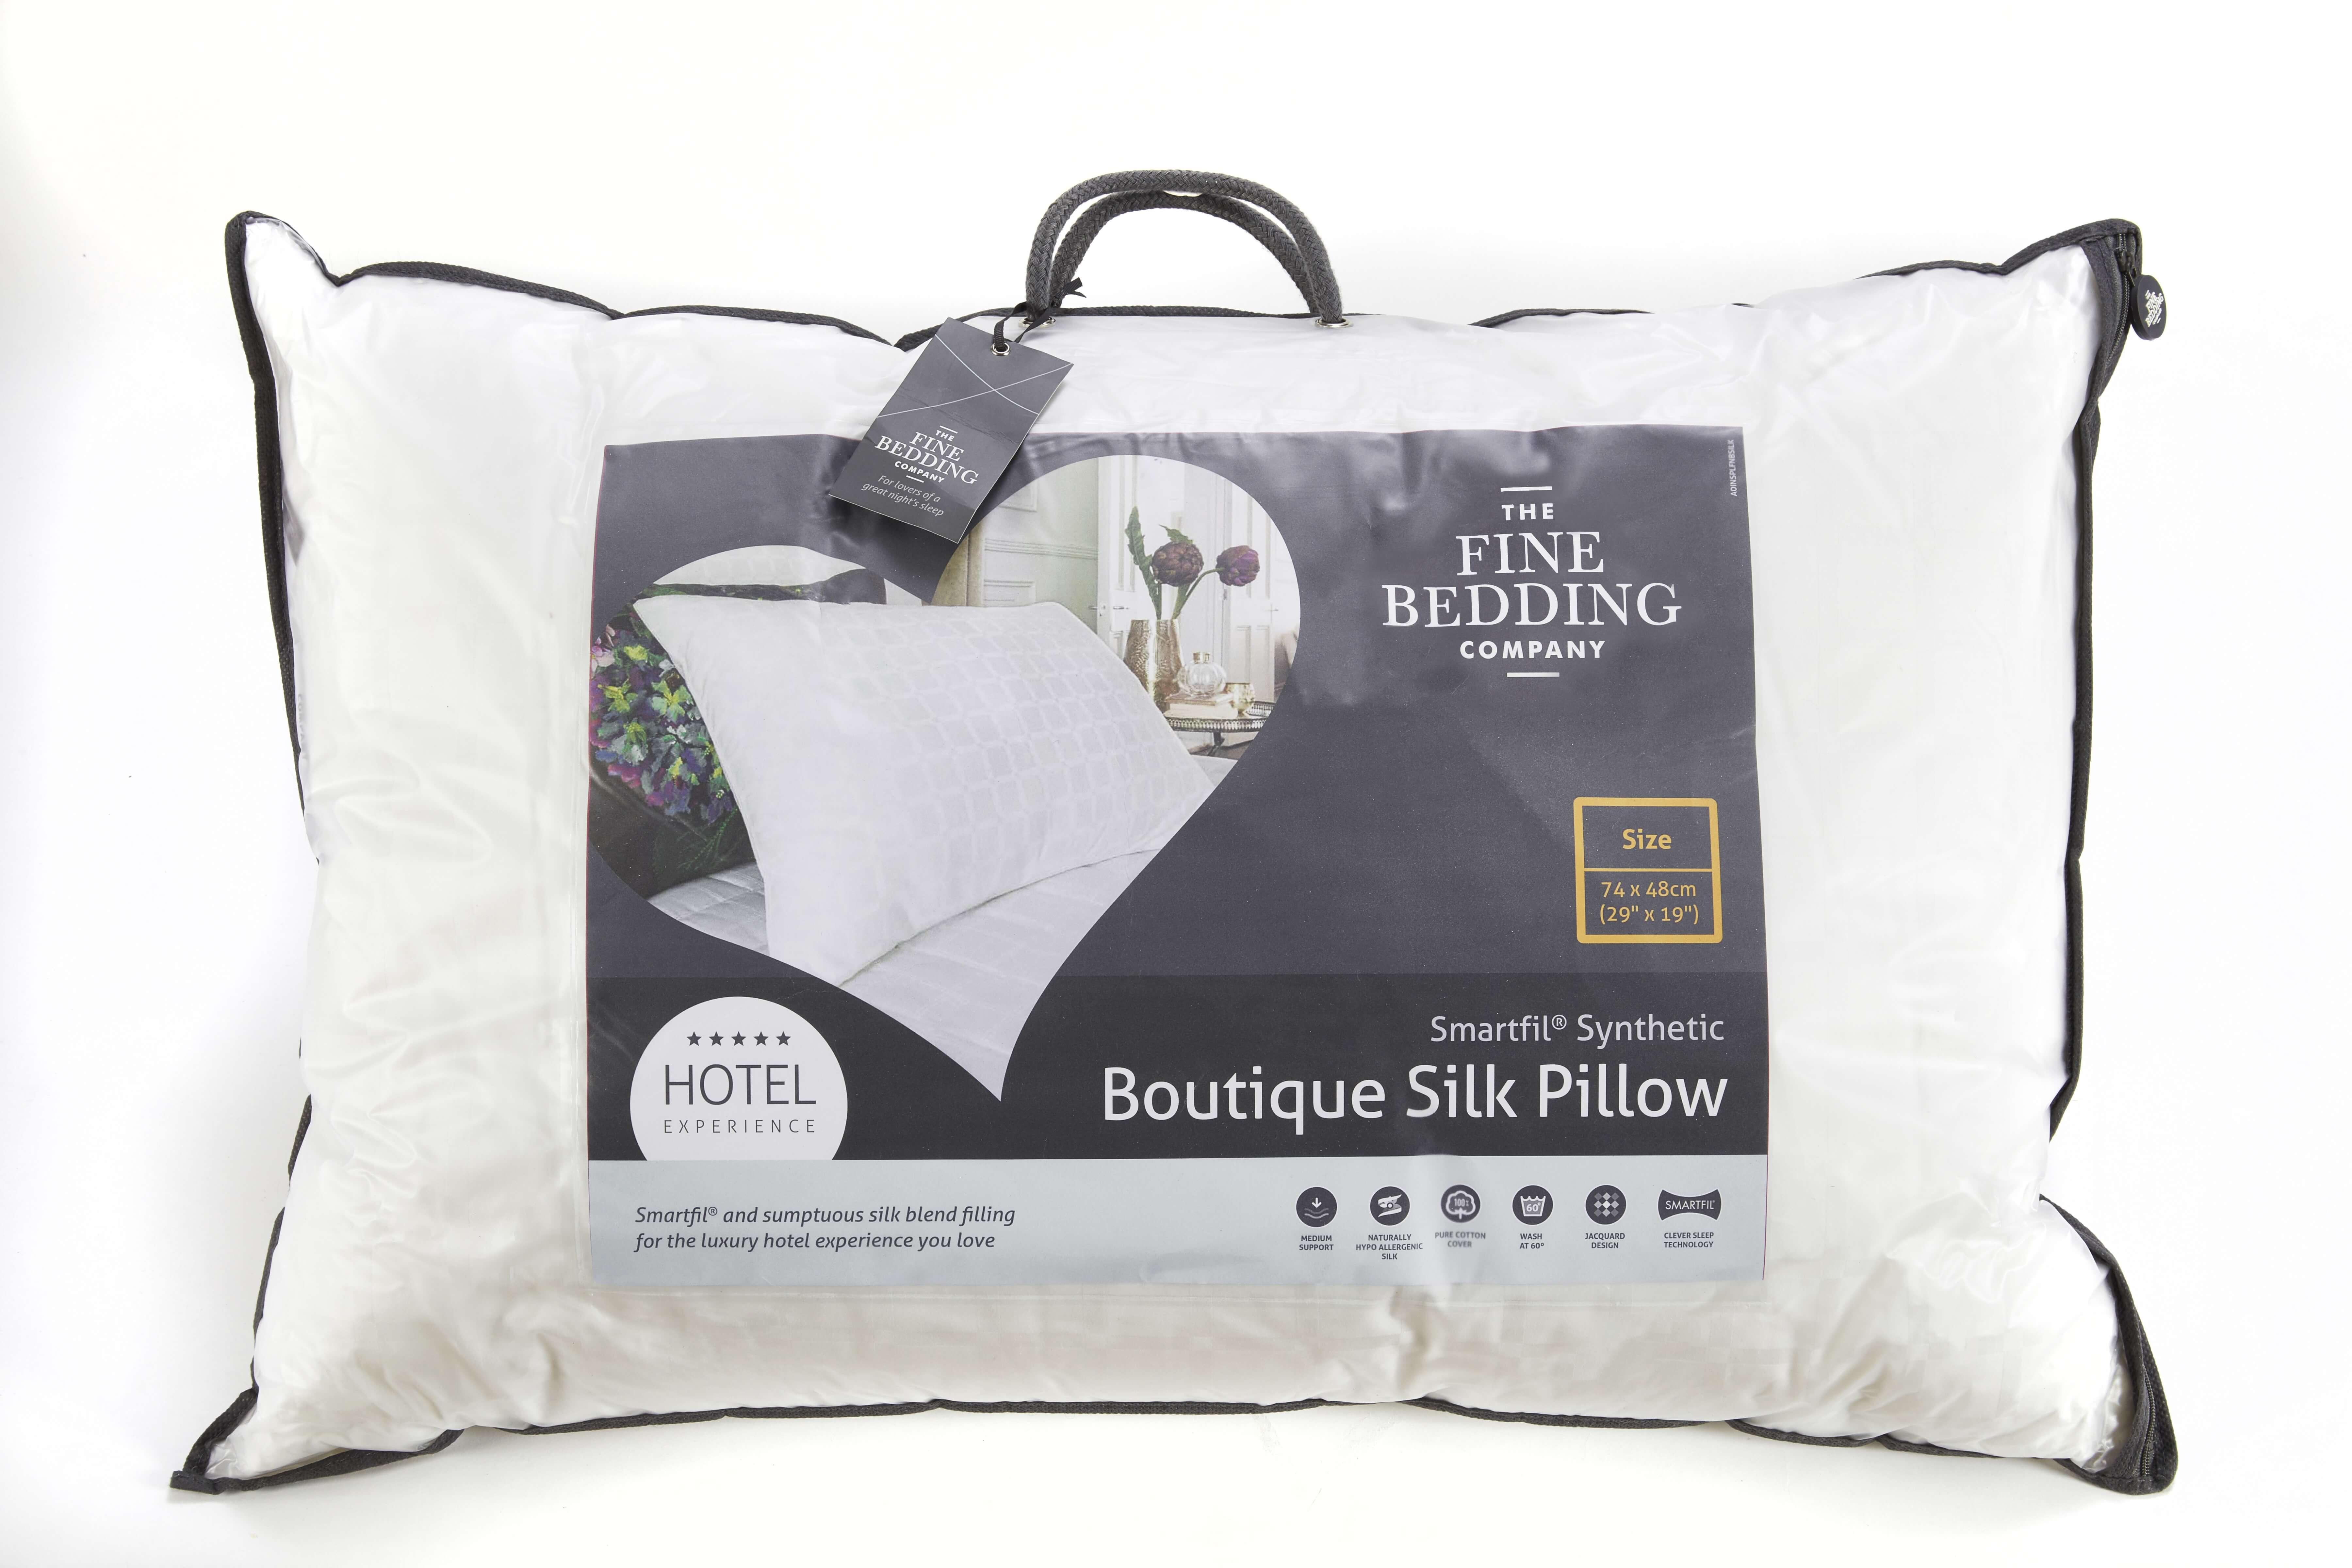 Boutique Silk Pillow - The Fine Bedding Company